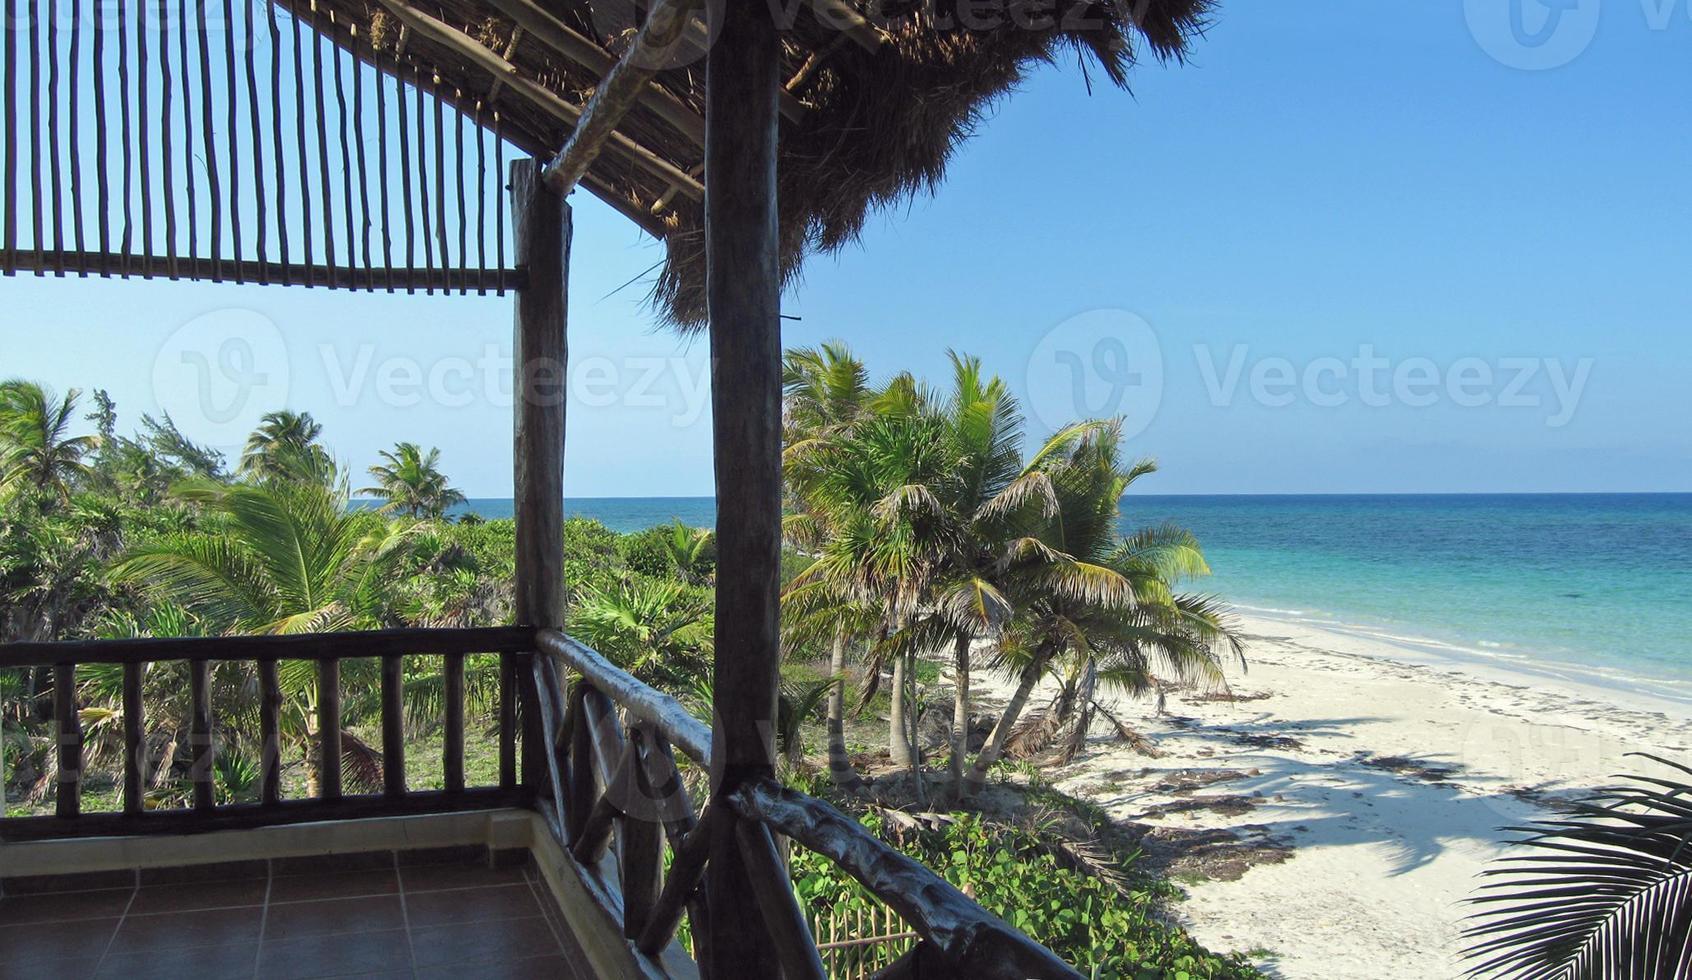 Karibik Meerblick vom Balkon foto